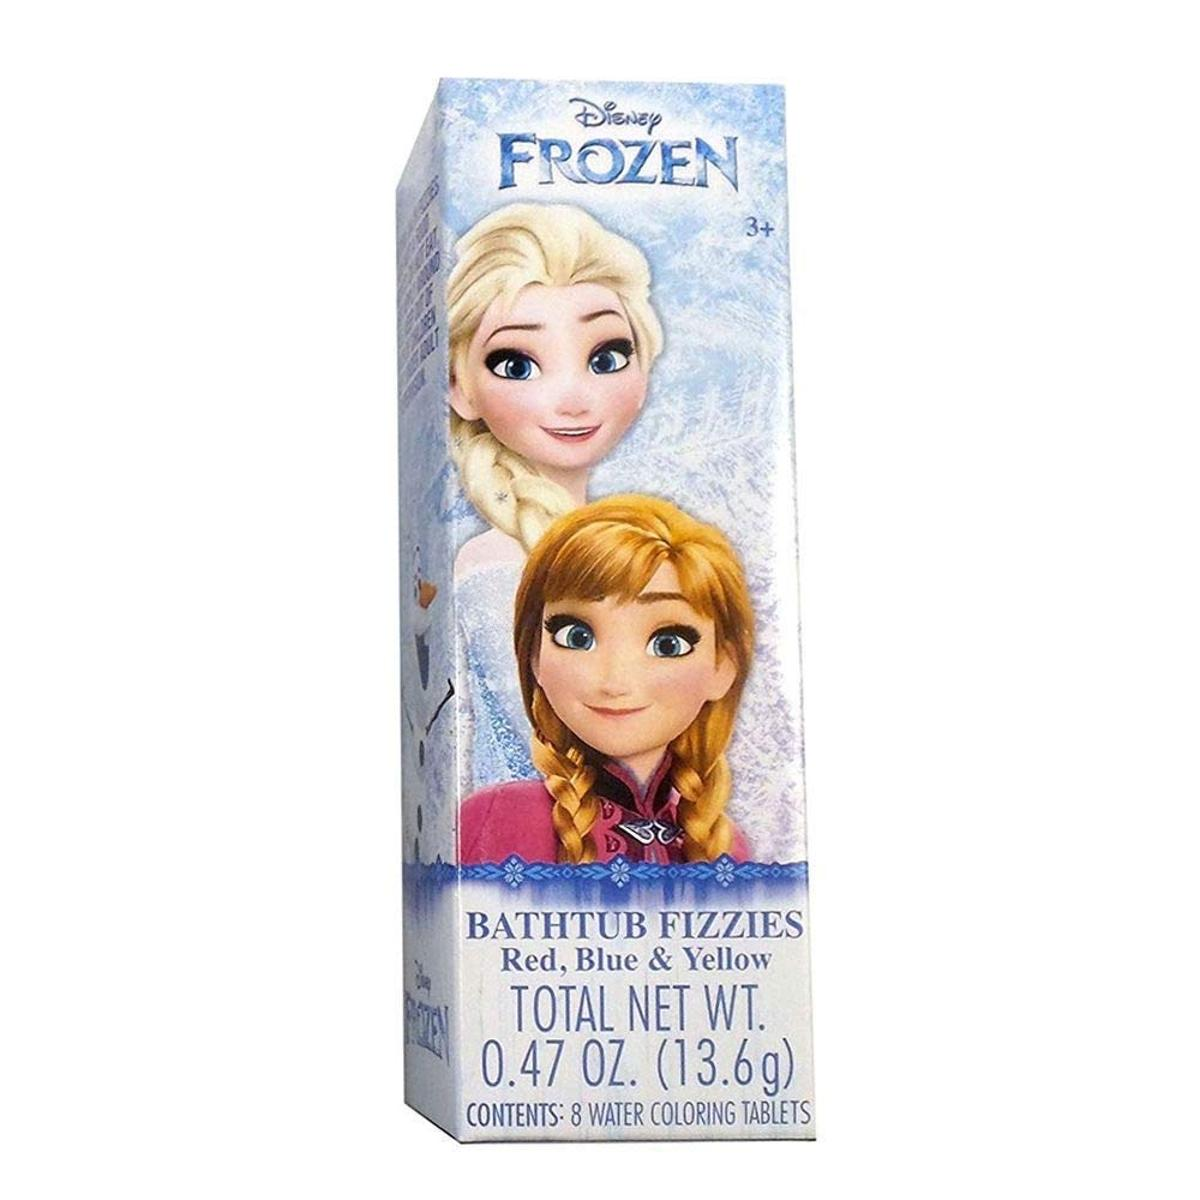 Frozen 8 Water Coloring Tablets  Bathtub Fizzies